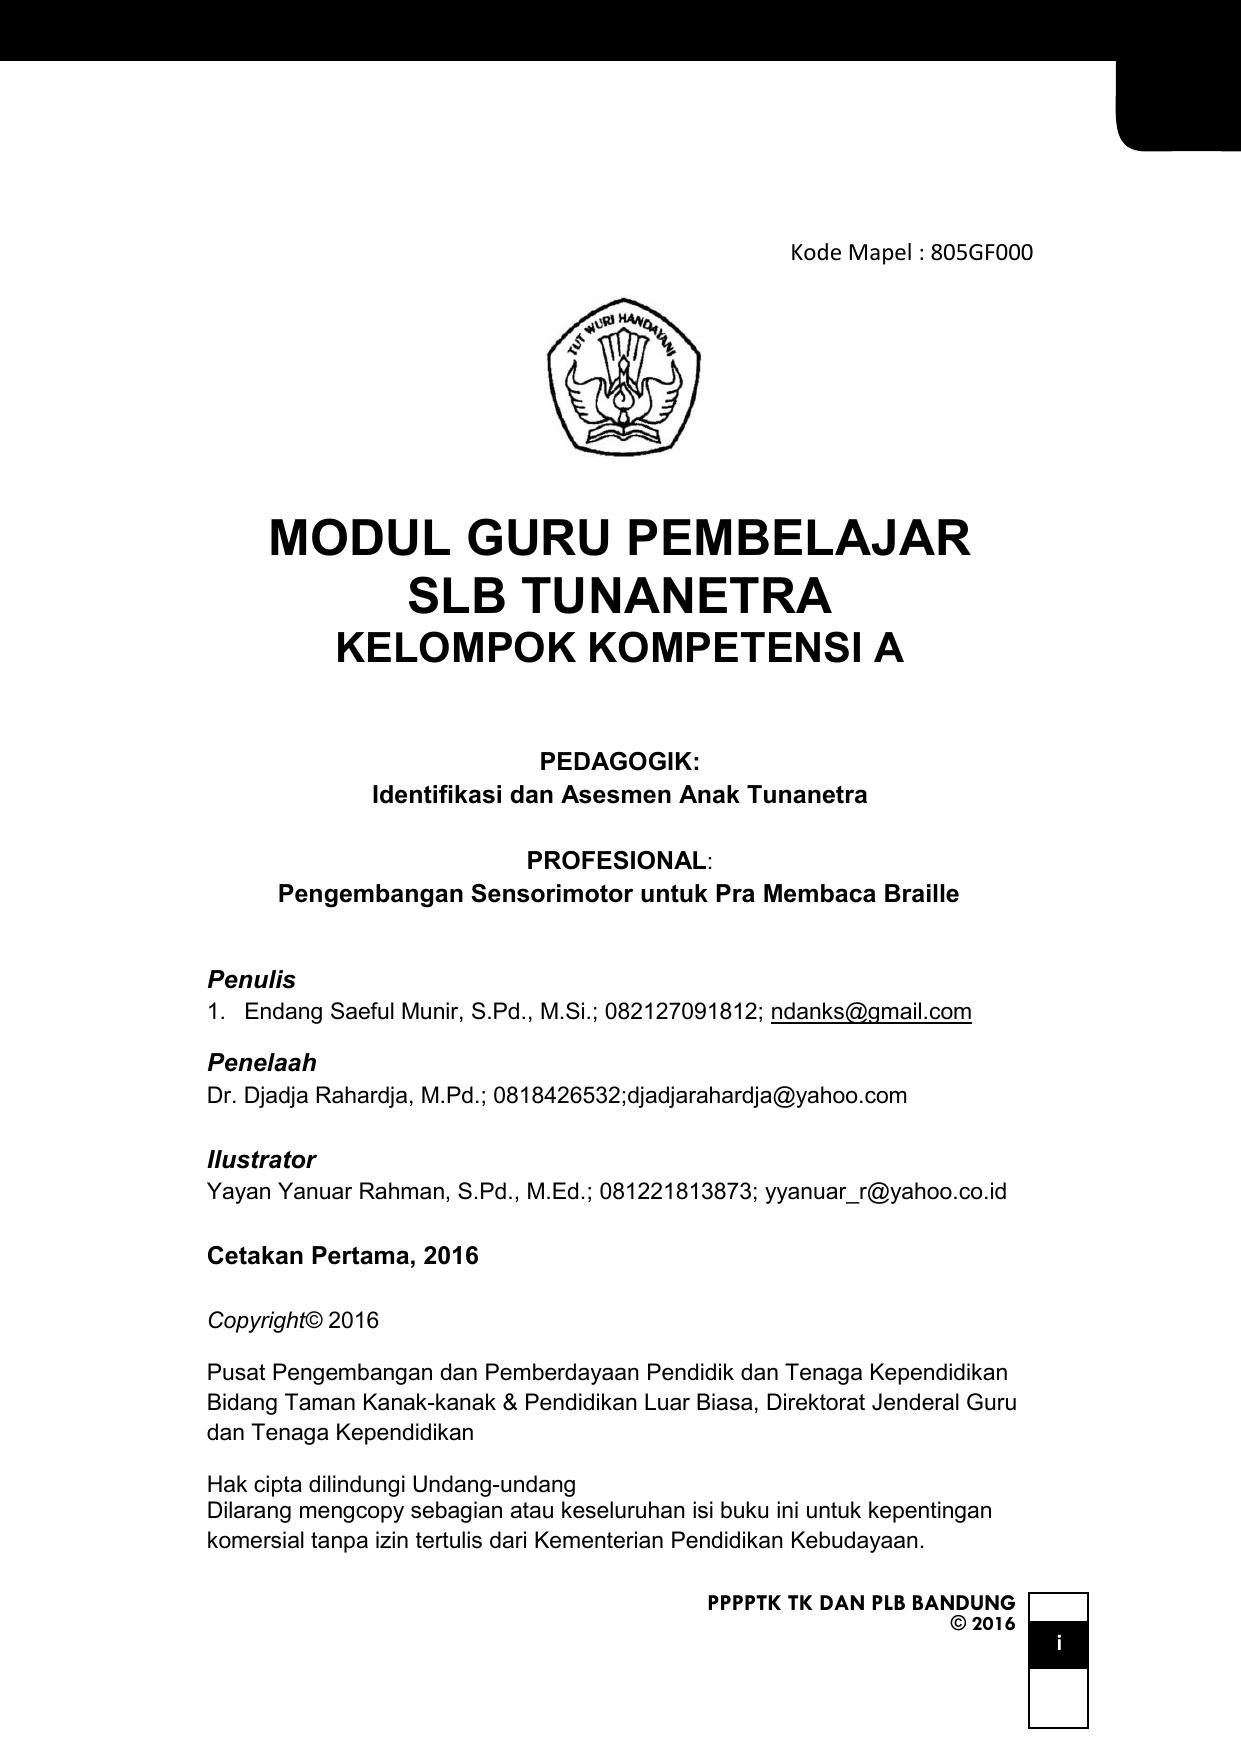 Kode Mapel 805GF000 MODUL GURU PEMBELAJAR SLB TUNANETRA KELOMPOK KOMPETENSI A PEDAGOGIK Identifikasi dan Asesmen Anak Tunanetra PROFESIONAL Pengembangan